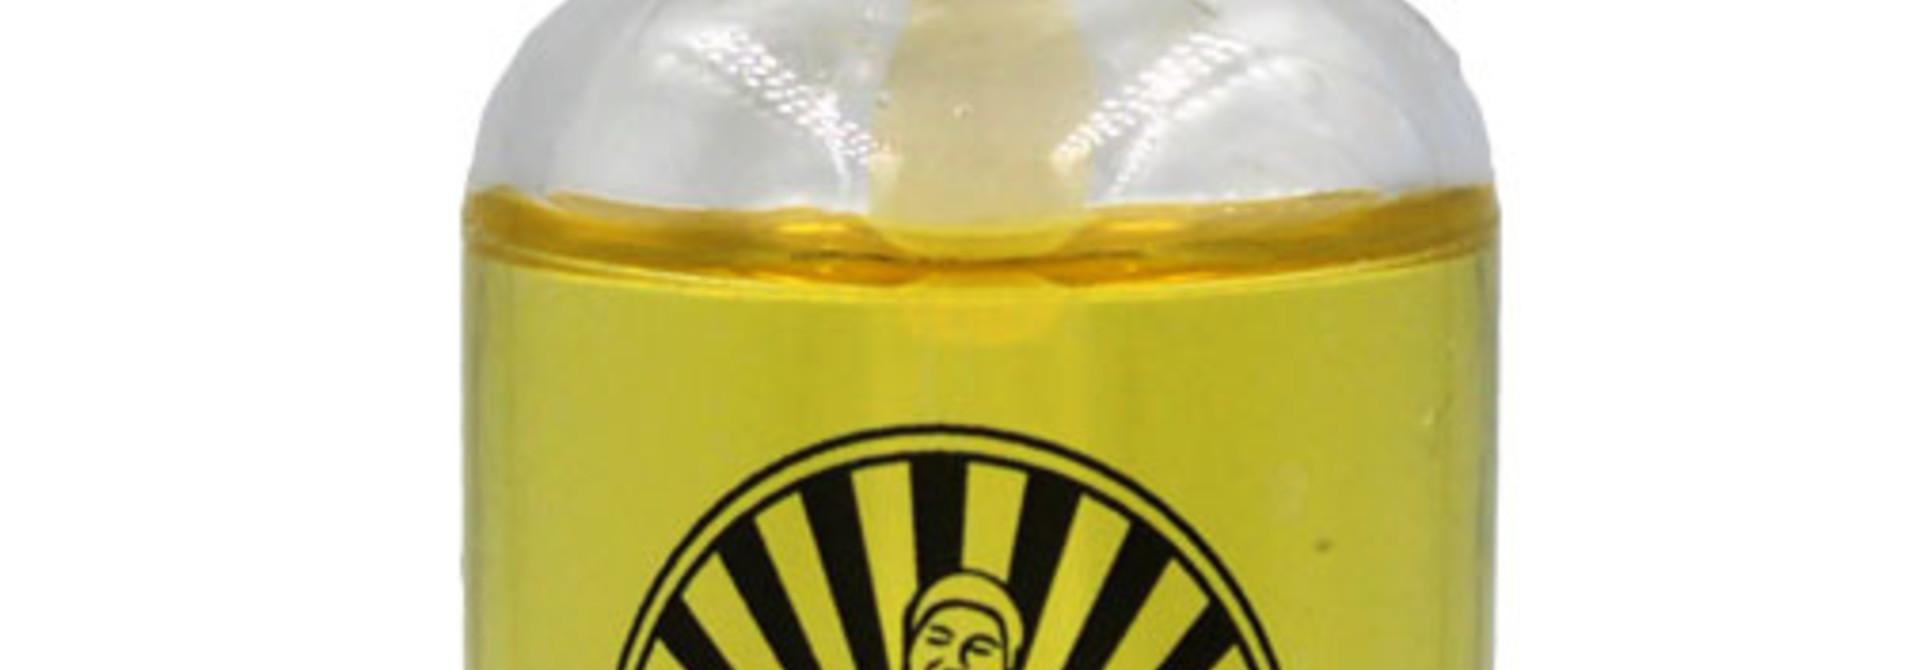 100 % Pure Argan Oil x CBD